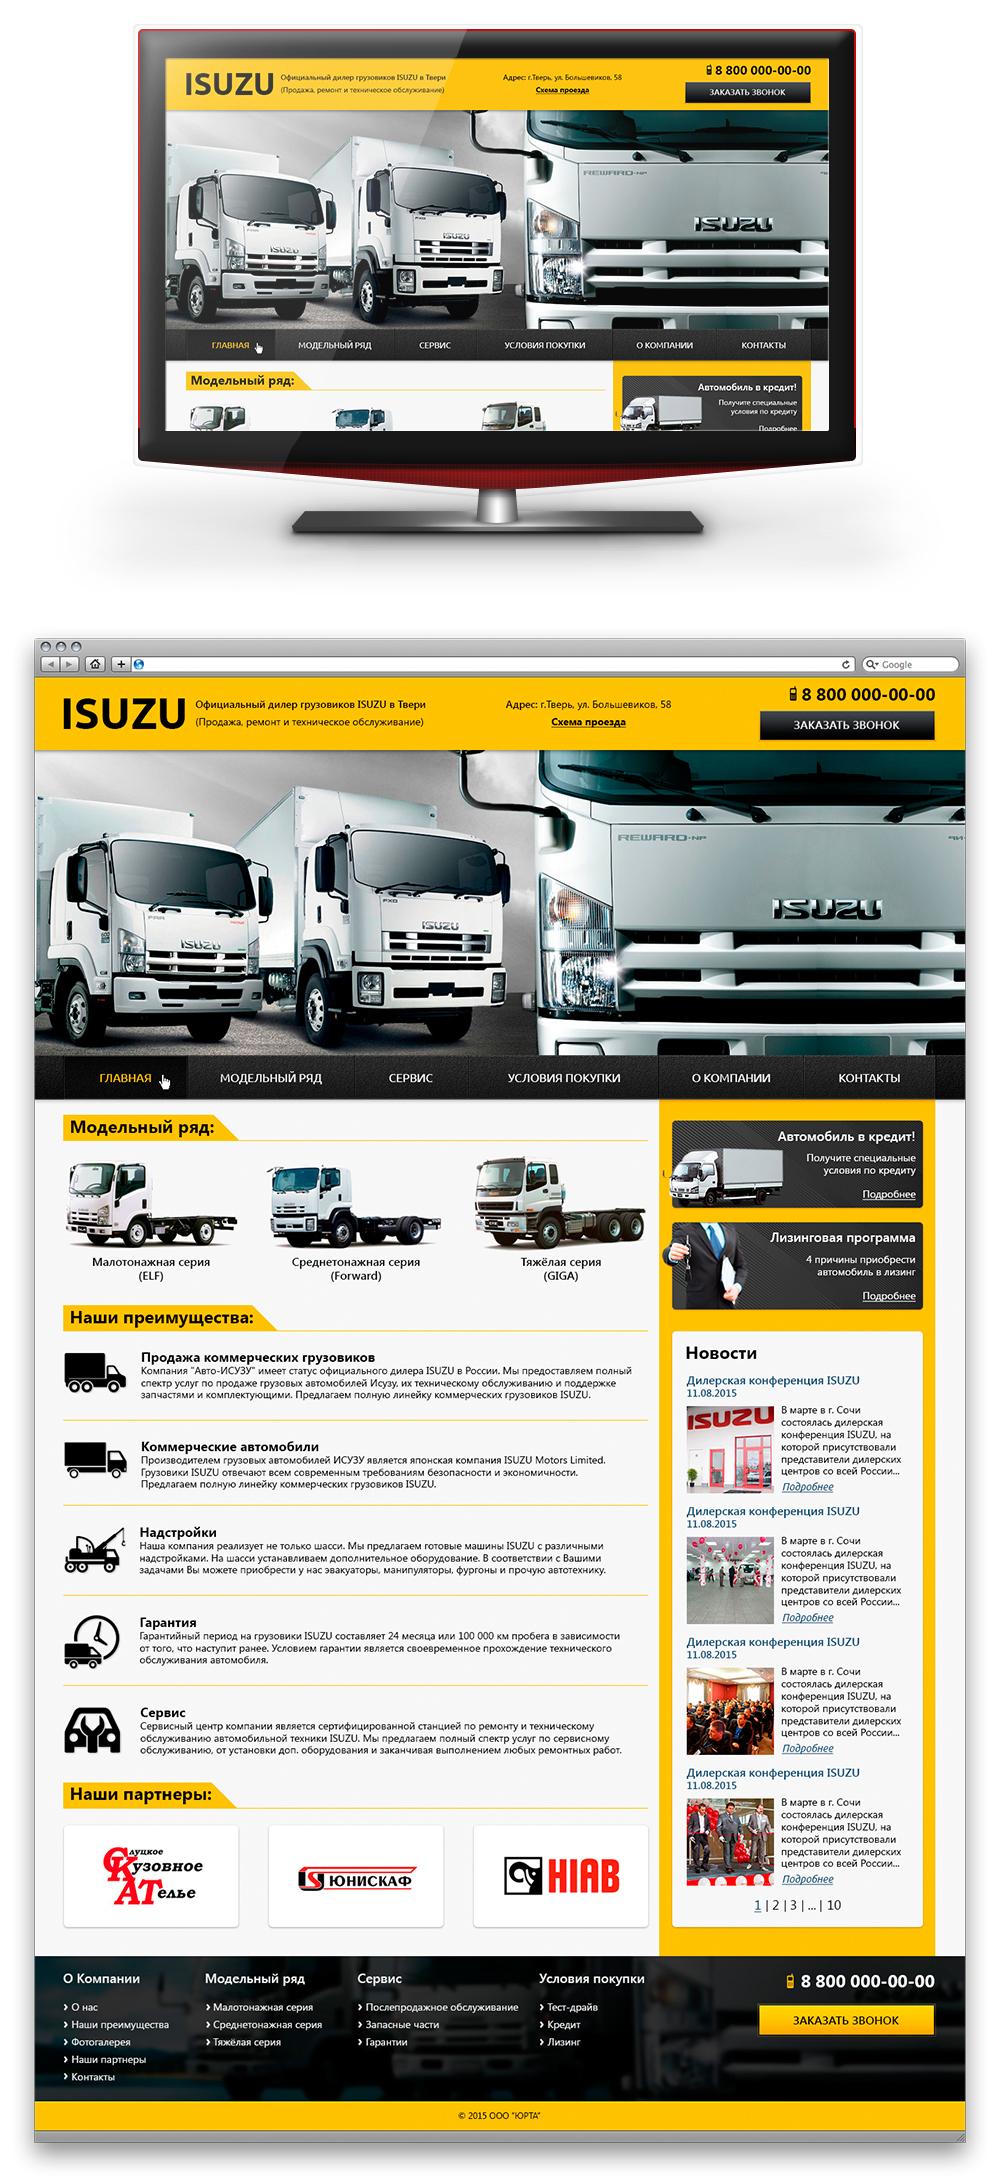 Дизайн сайта дилера ISUZU